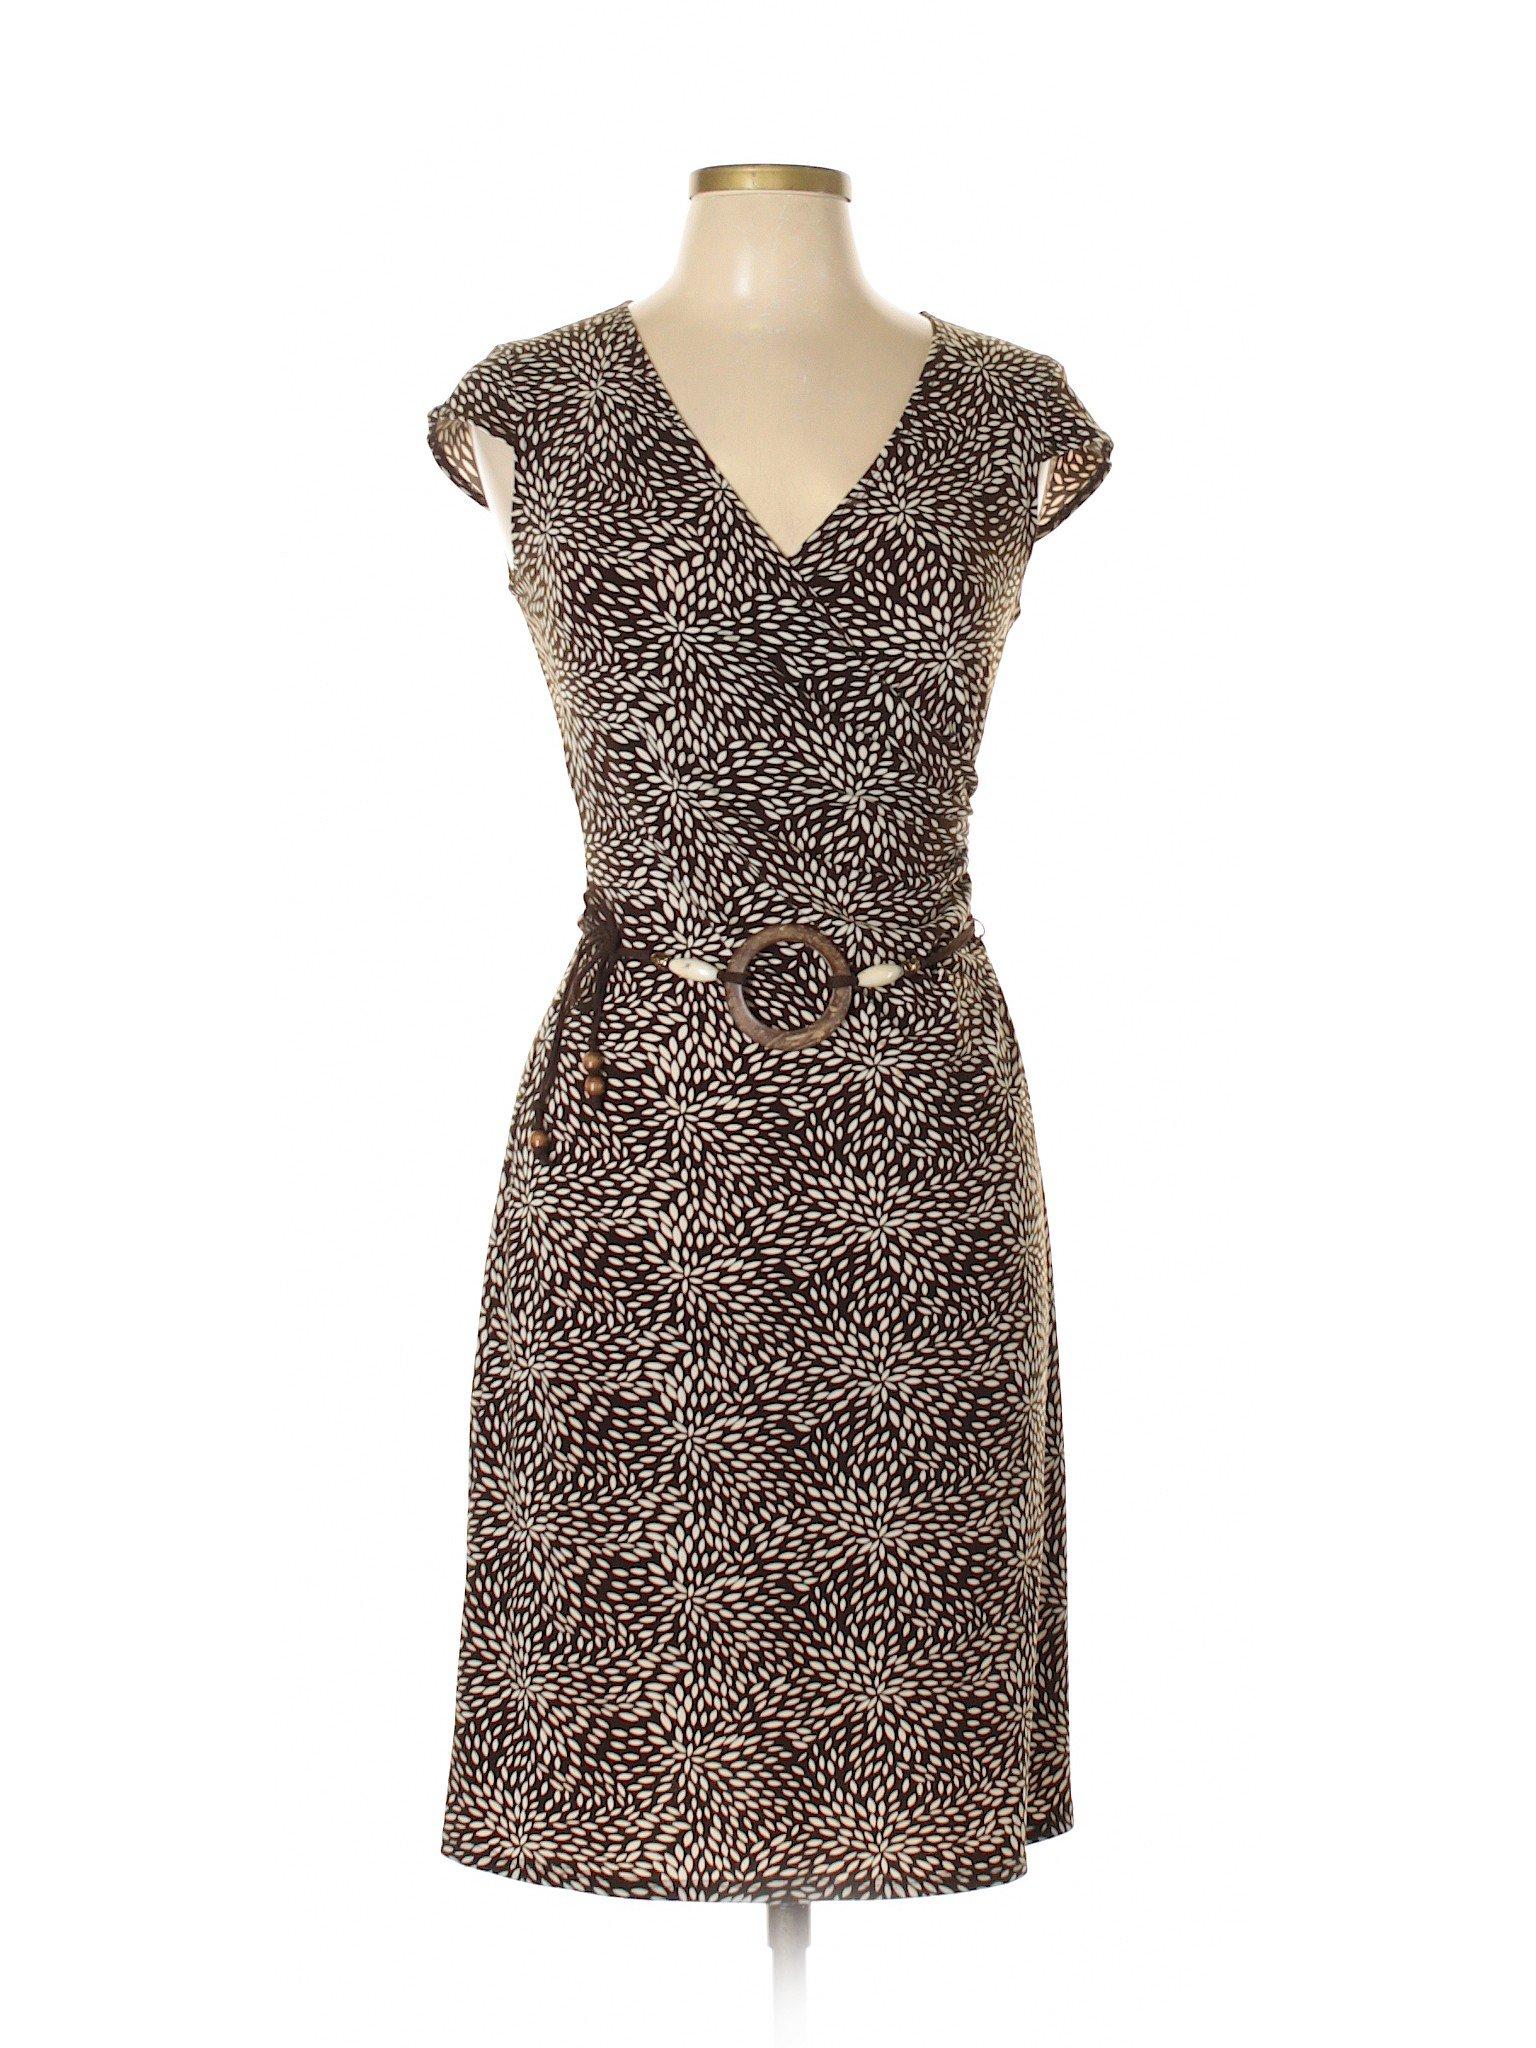 Dress Lyman Casual Boutique winter Frank Design wE0nXxvAq